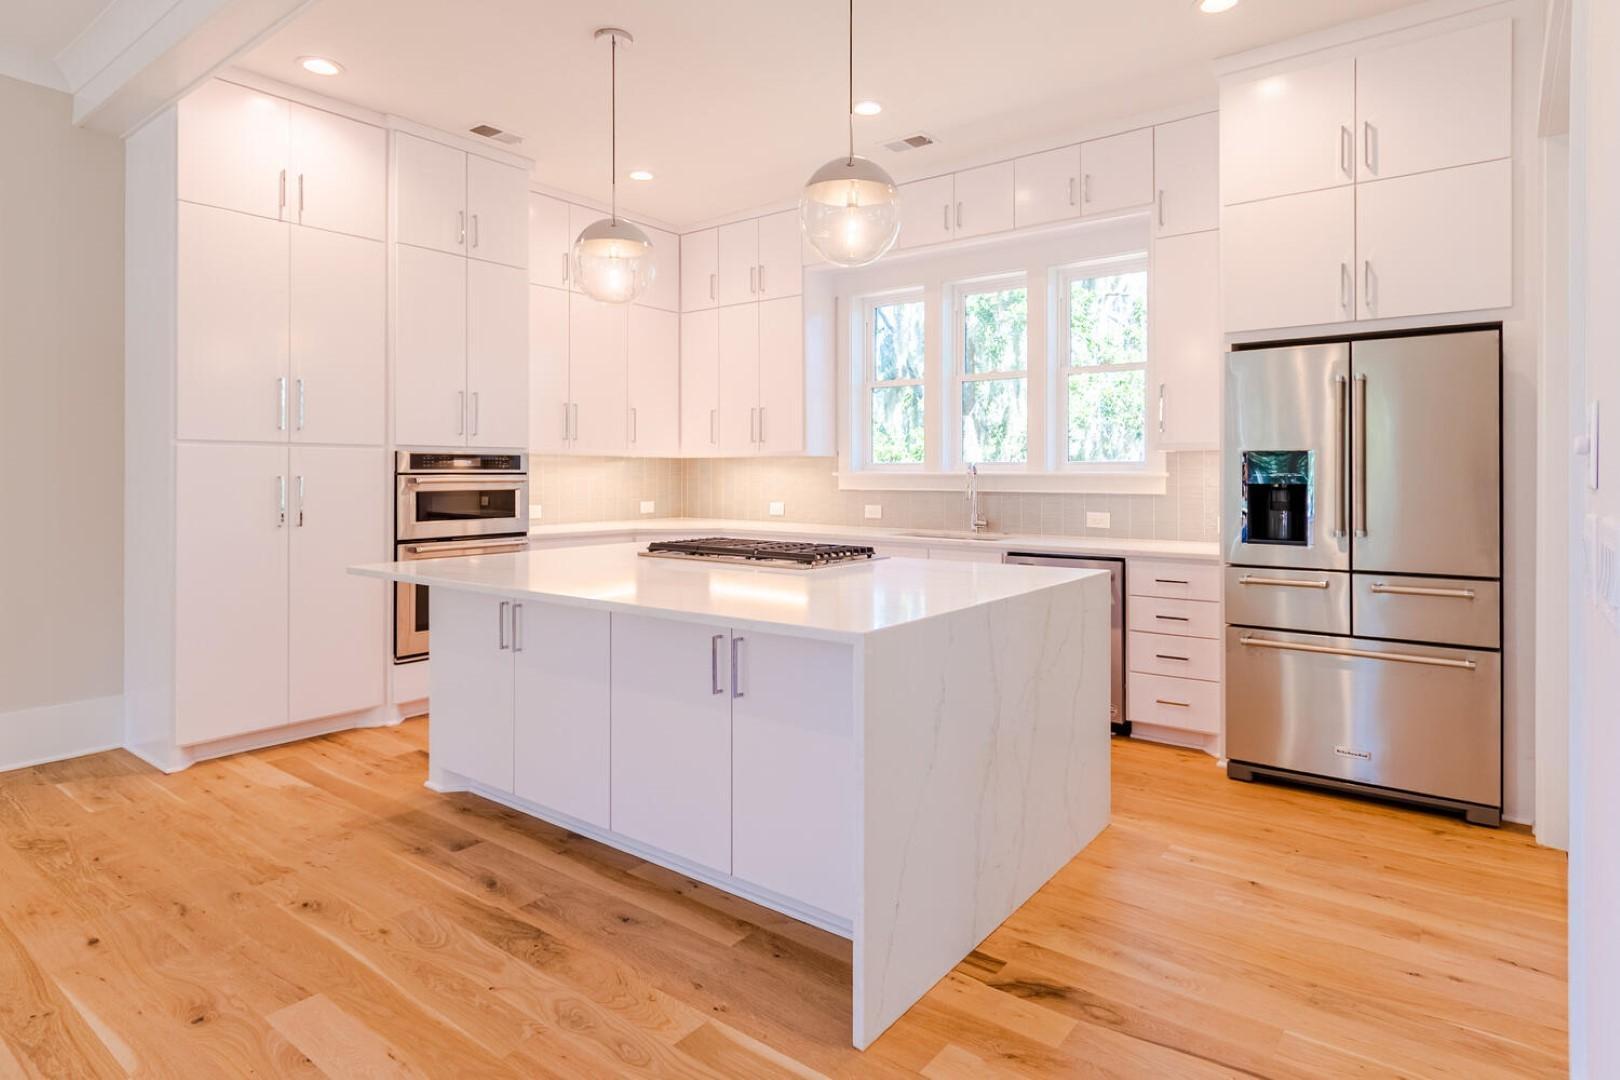 Scanlonville Homes For Sale - 156 5th, Mount Pleasant, SC - 10